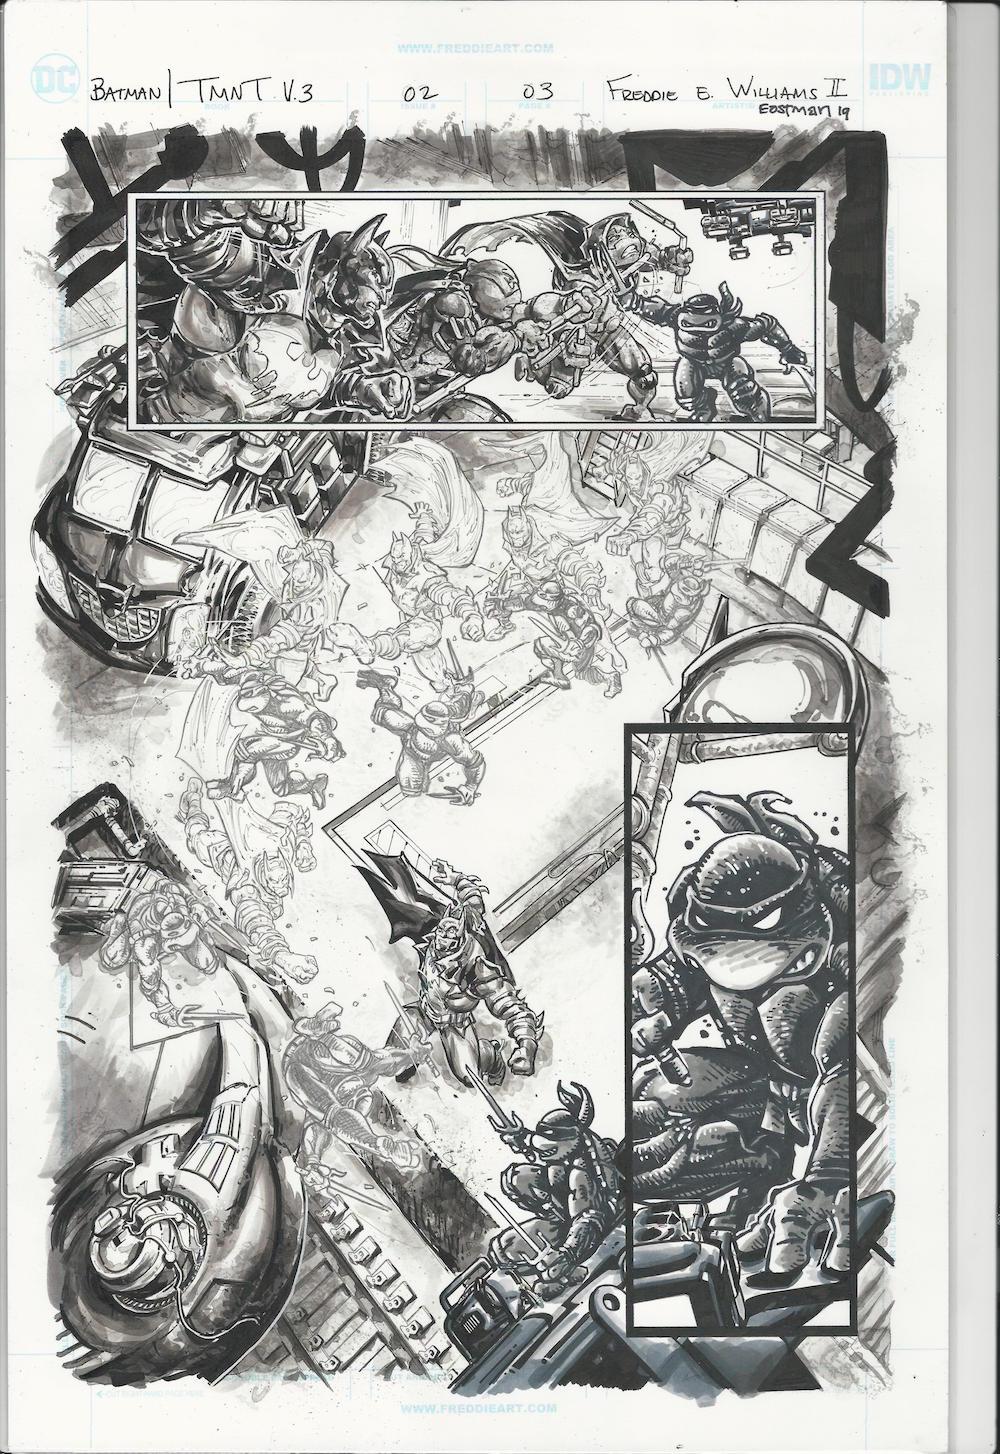 Batman TMNT Art for Sale - Freddie Williams II and me